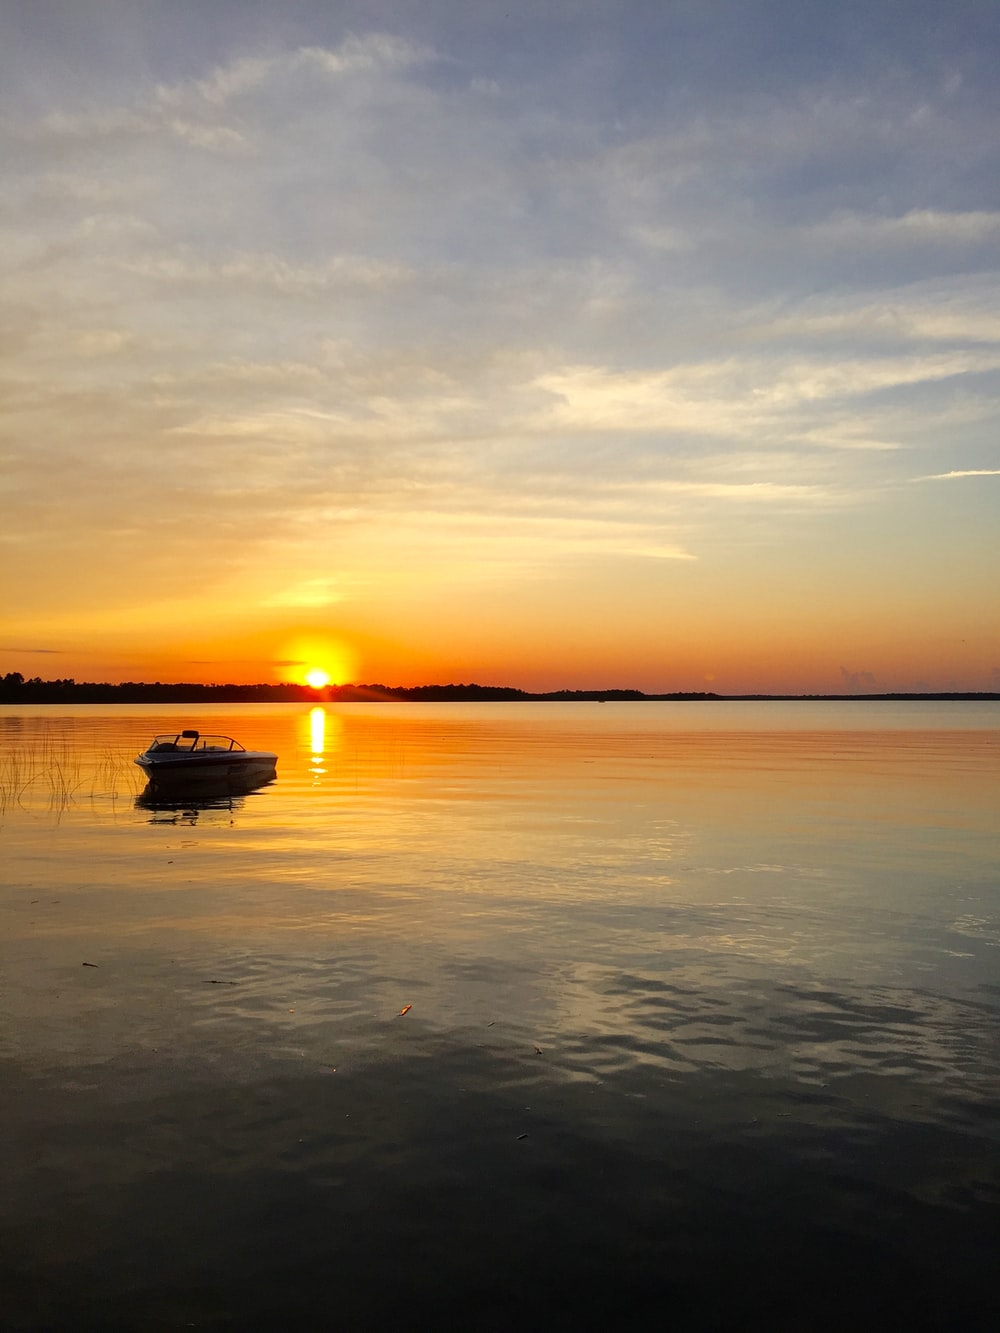 boat adrift away from shore during sunset